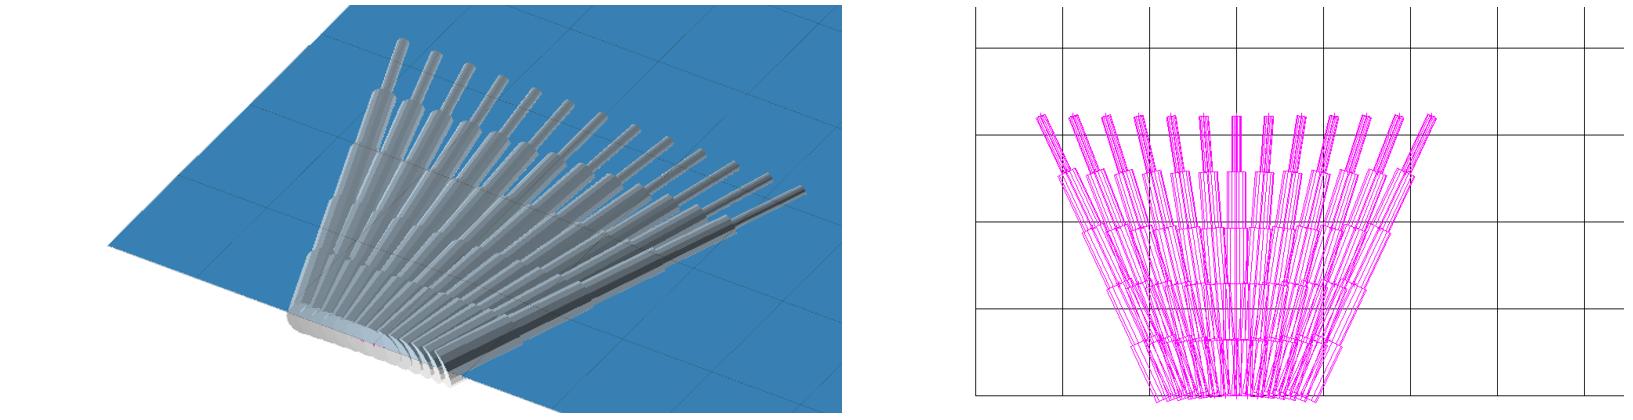 Fig. 35Fictitious struts with concrete finite element mesh.